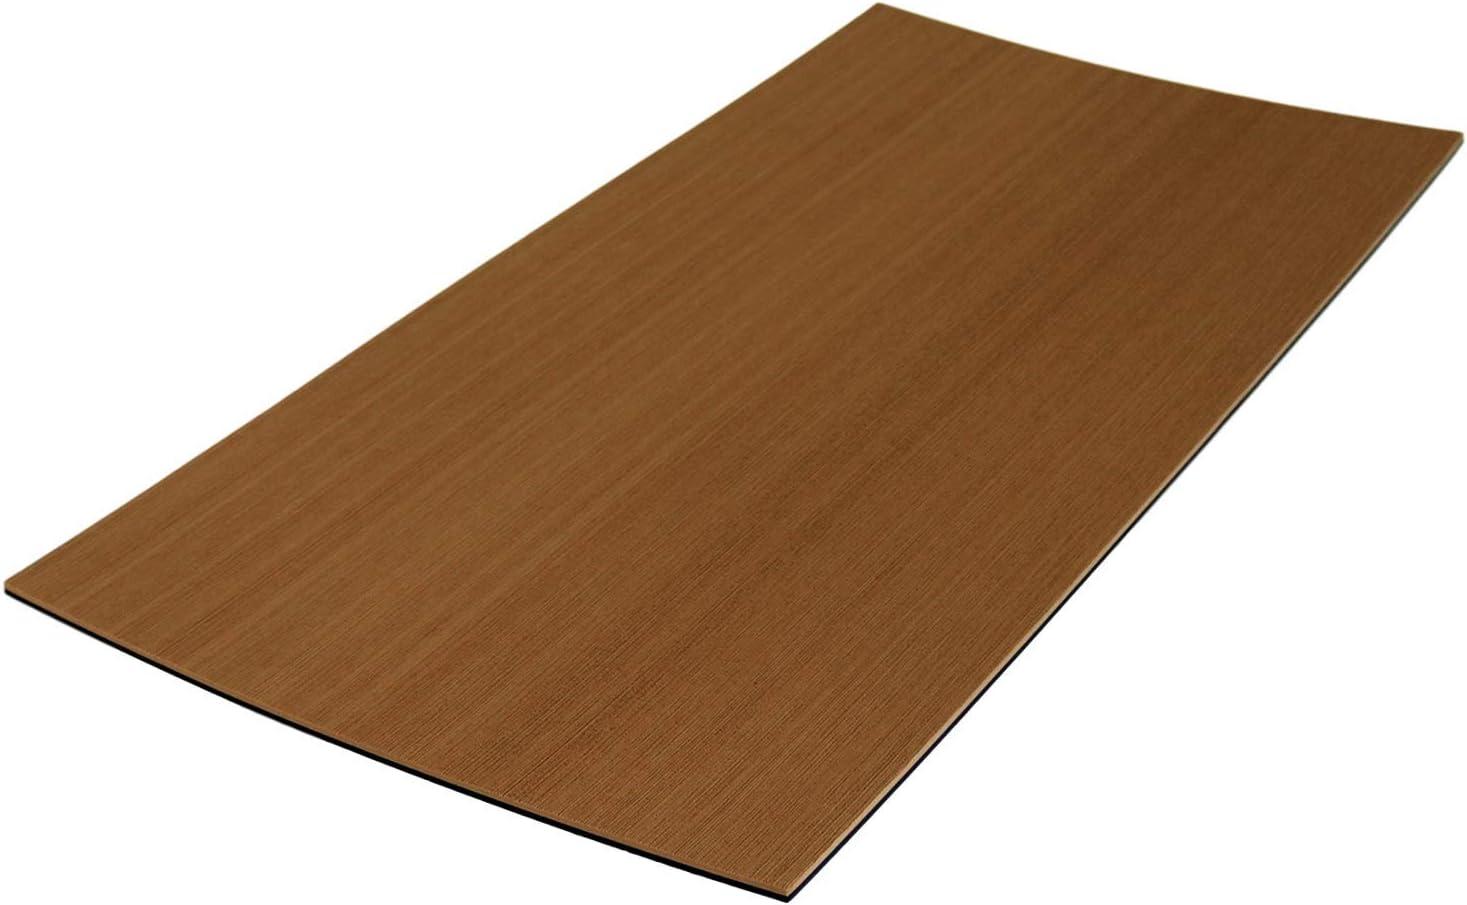 "Castaway Customs SeaDek- EVA Foam Boat Flooring Decking Non Skid Adhesive Simple Application   Rectangle   15"" x 39"""